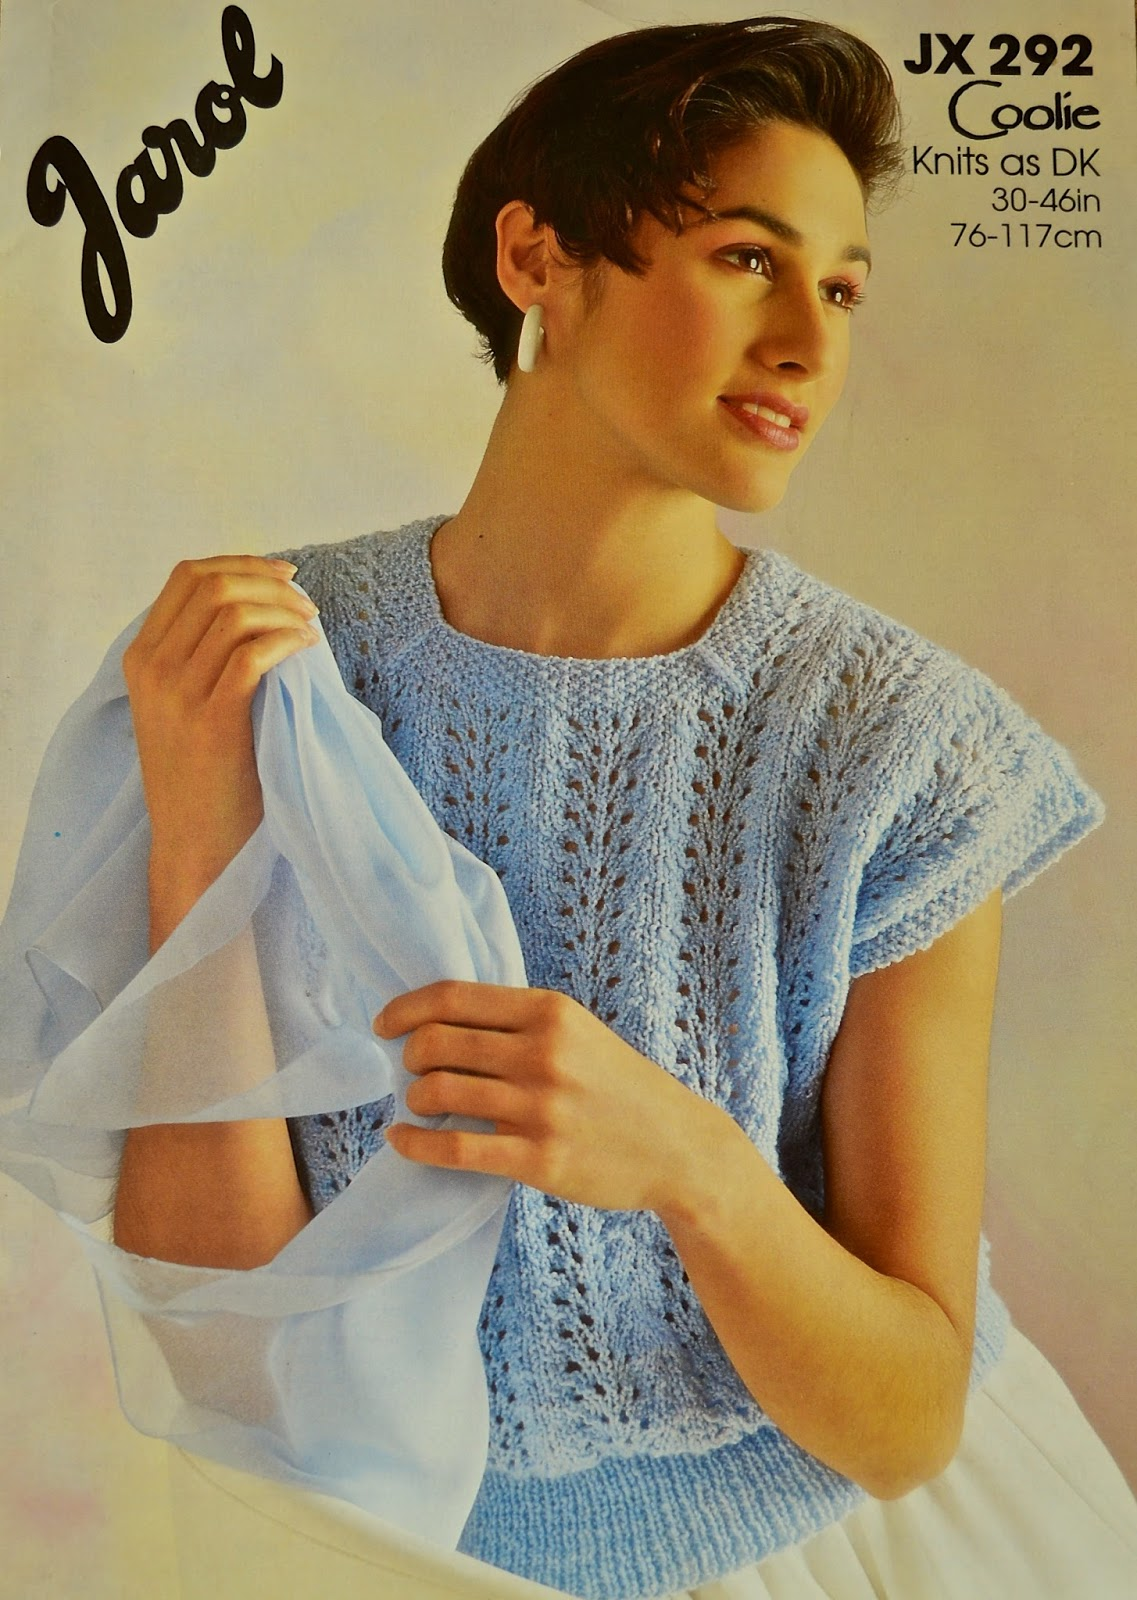 Knitting Novice Vintage 80s Knitting Patterns Part 3